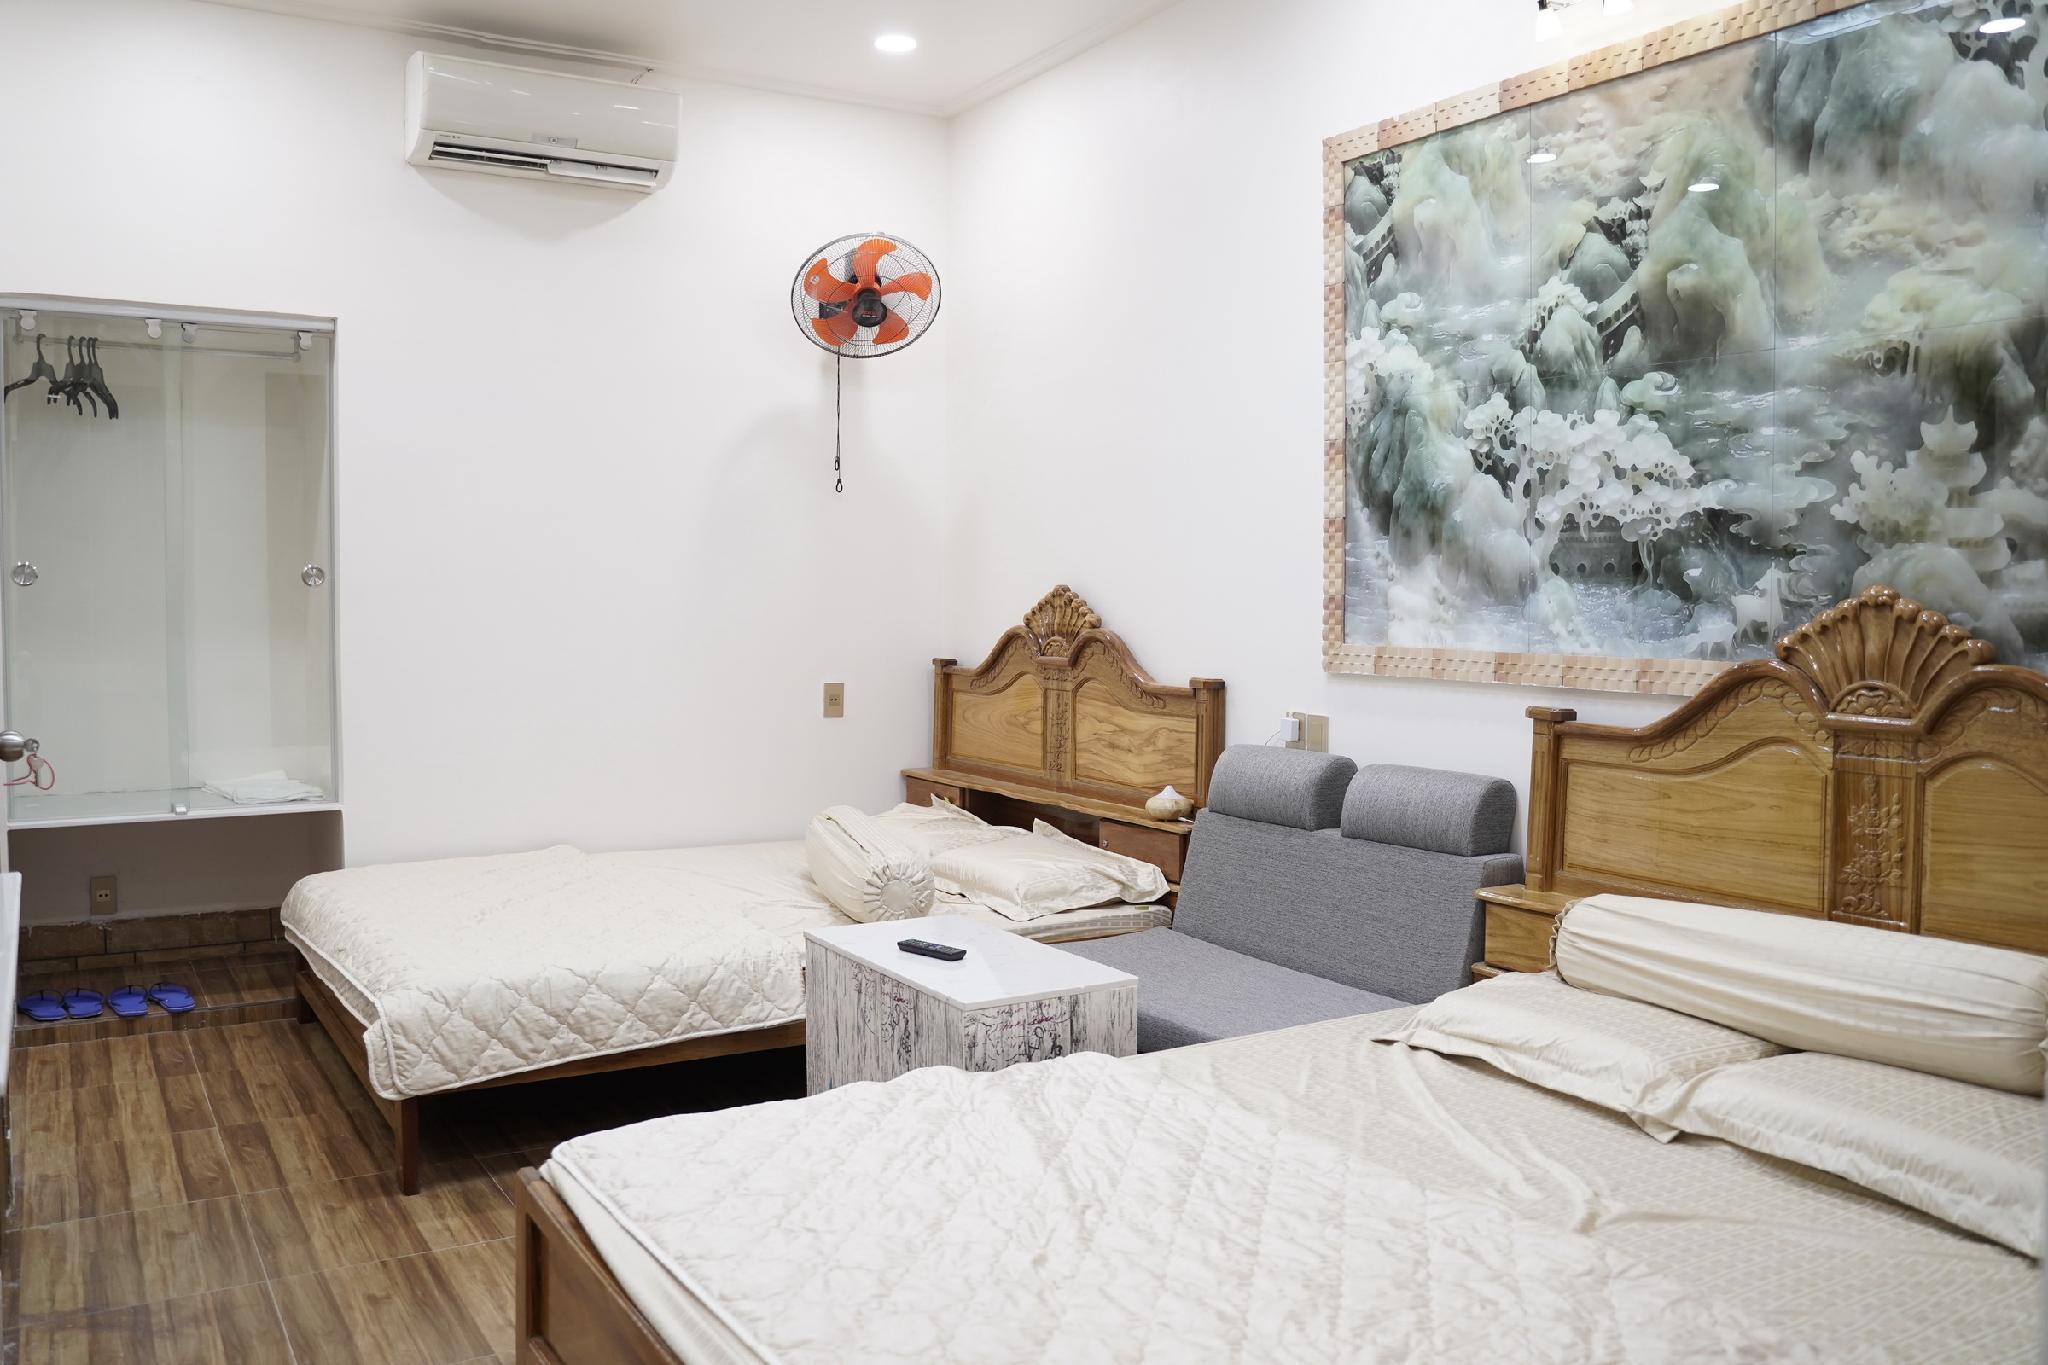 Duy Anh Hotel, Bien Hoa